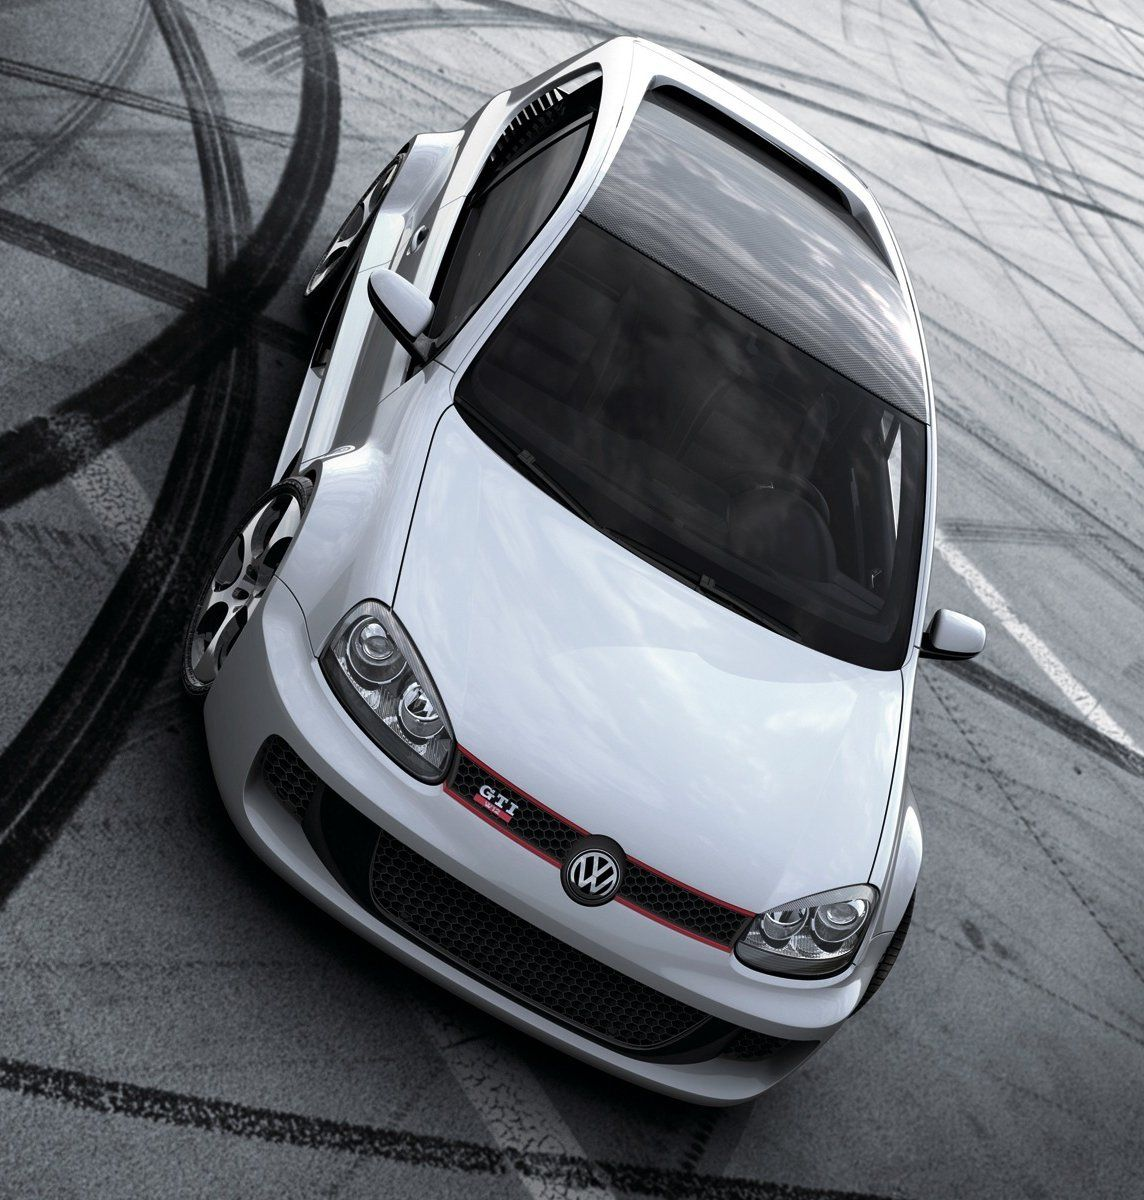 power cars vw golf 5 gti w12 650. Black Bedroom Furniture Sets. Home Design Ideas